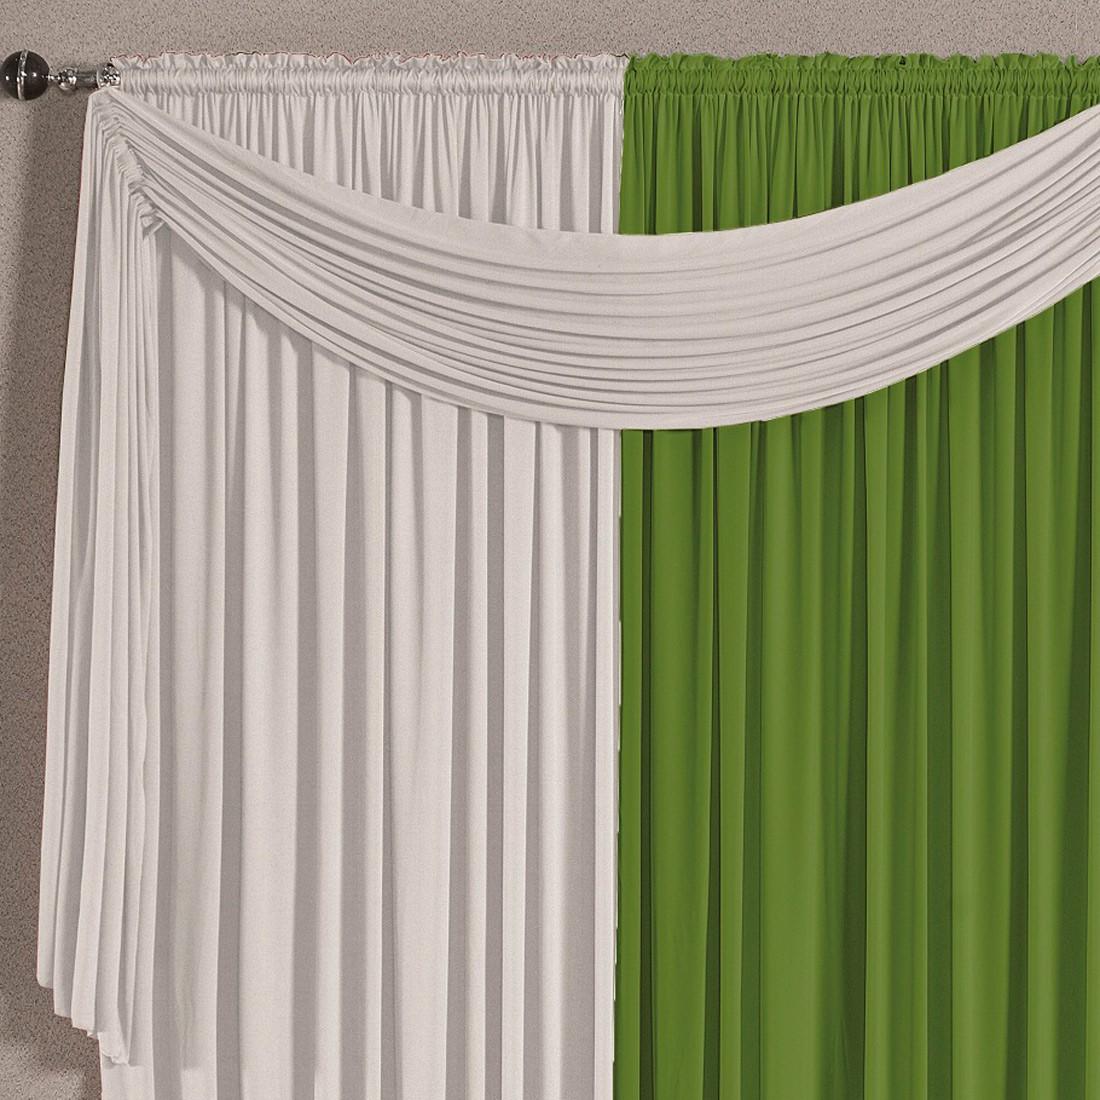 Cortina Versatty Verde/Branco 4,00m X 2,60m p/ Varão Simples